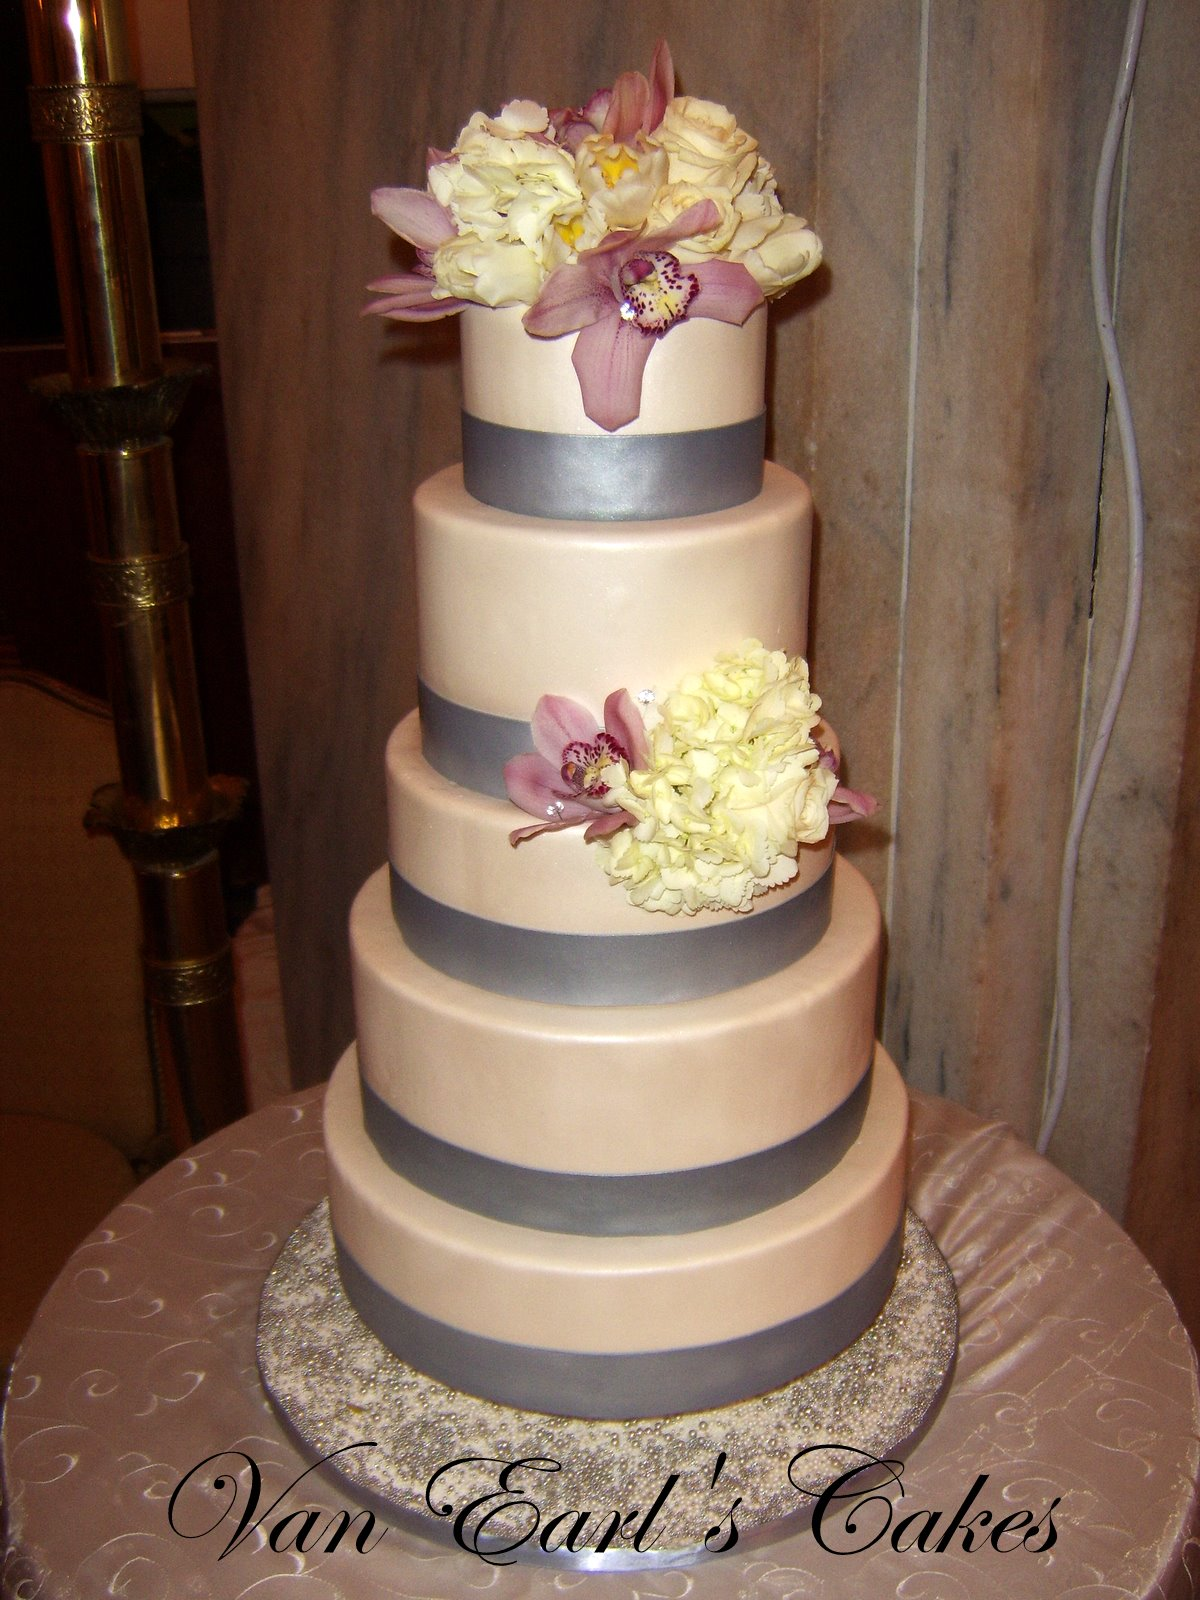 Van Earl s Cakes Five Tier Ivory & Silver Wedding Cake